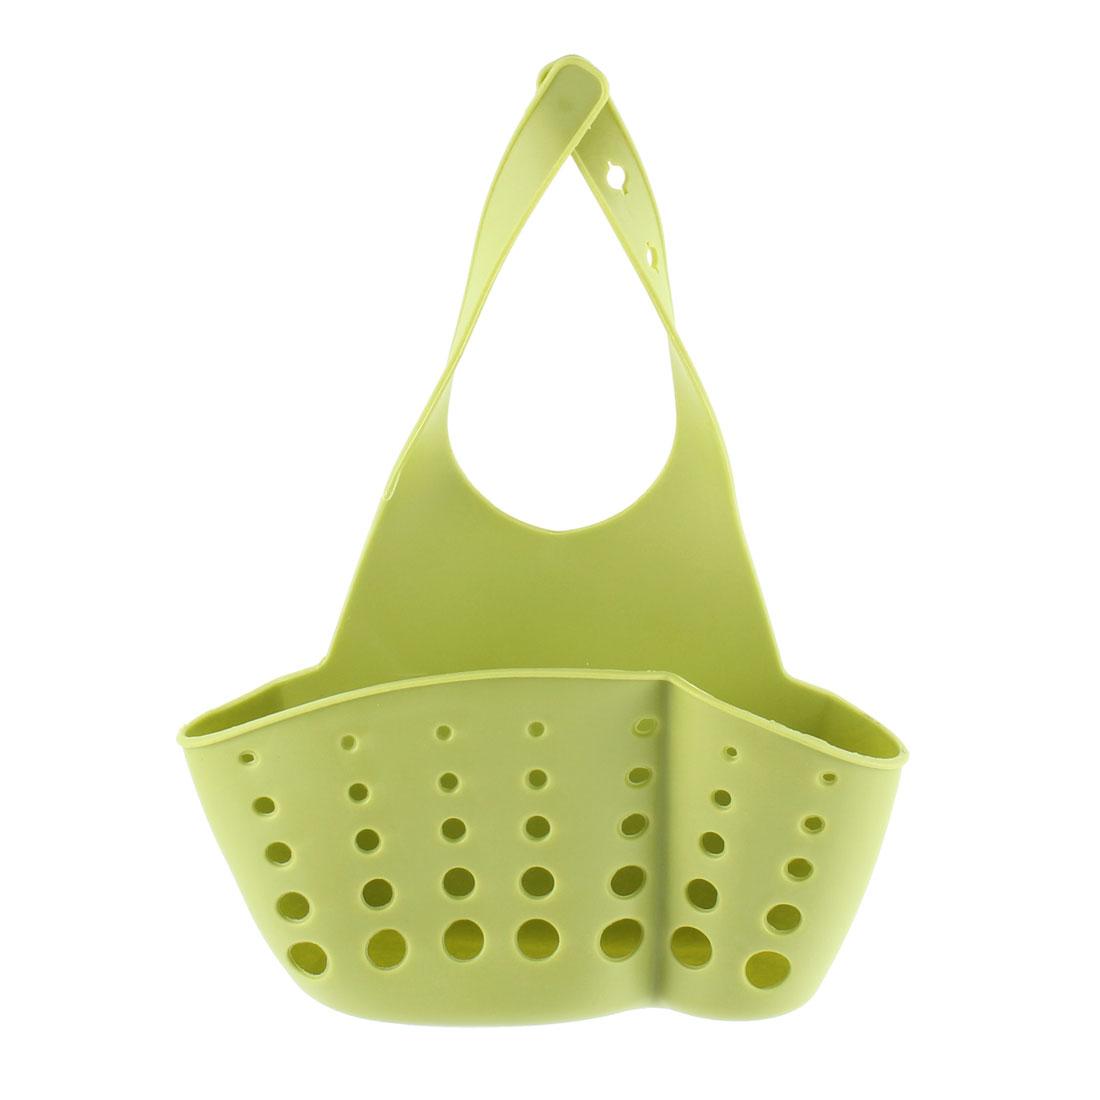 Kitchen Sink Faucet Dish Wash PVC Sponge Storage Hanger Holder Basket Yellow Green